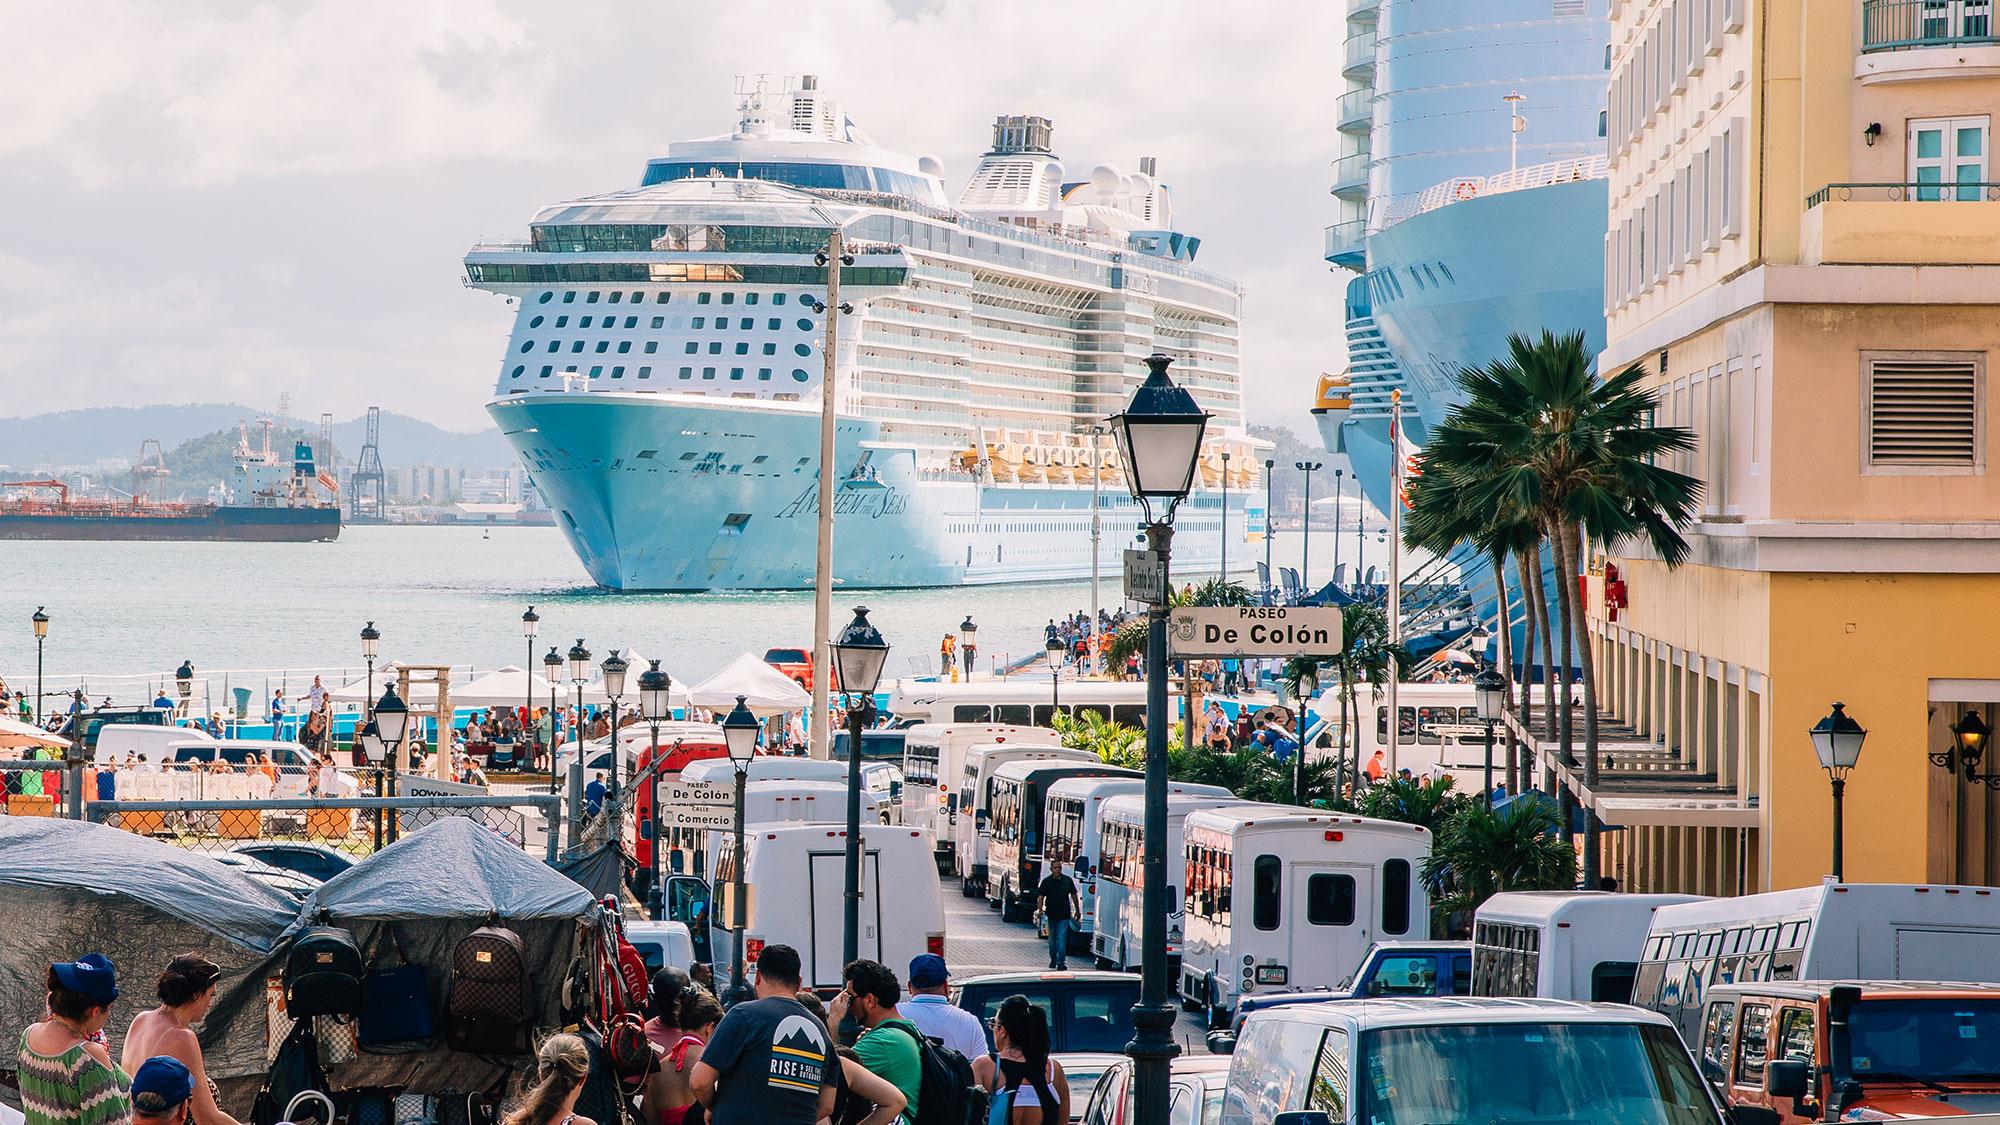 San Juan's busy cruise port on Jan. 8.